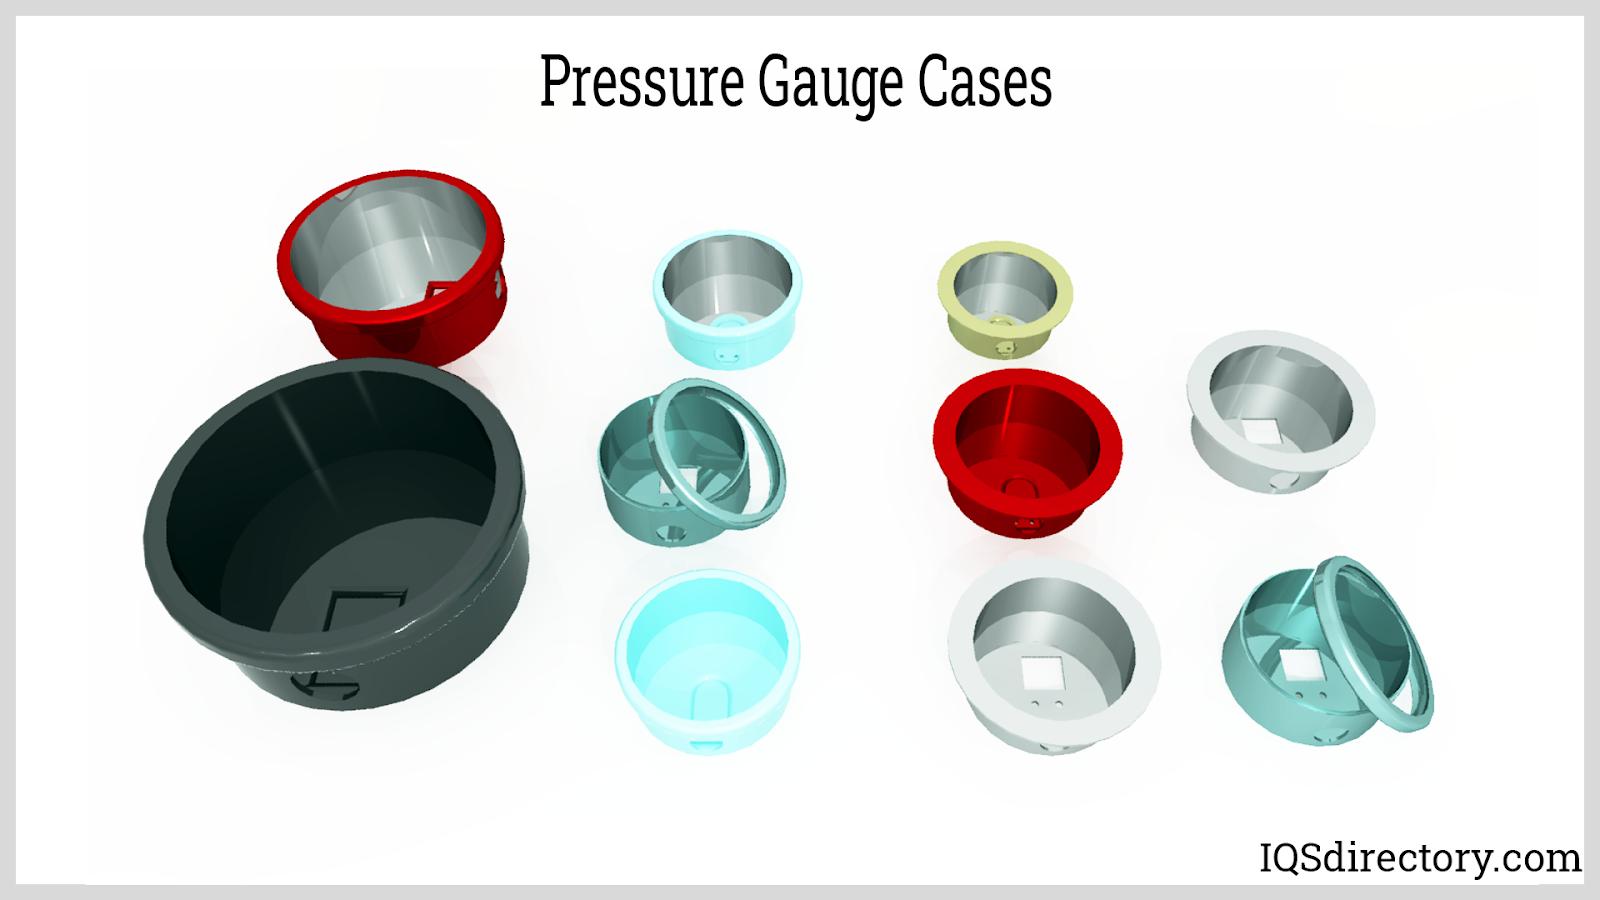 Pressure Gauge Cases